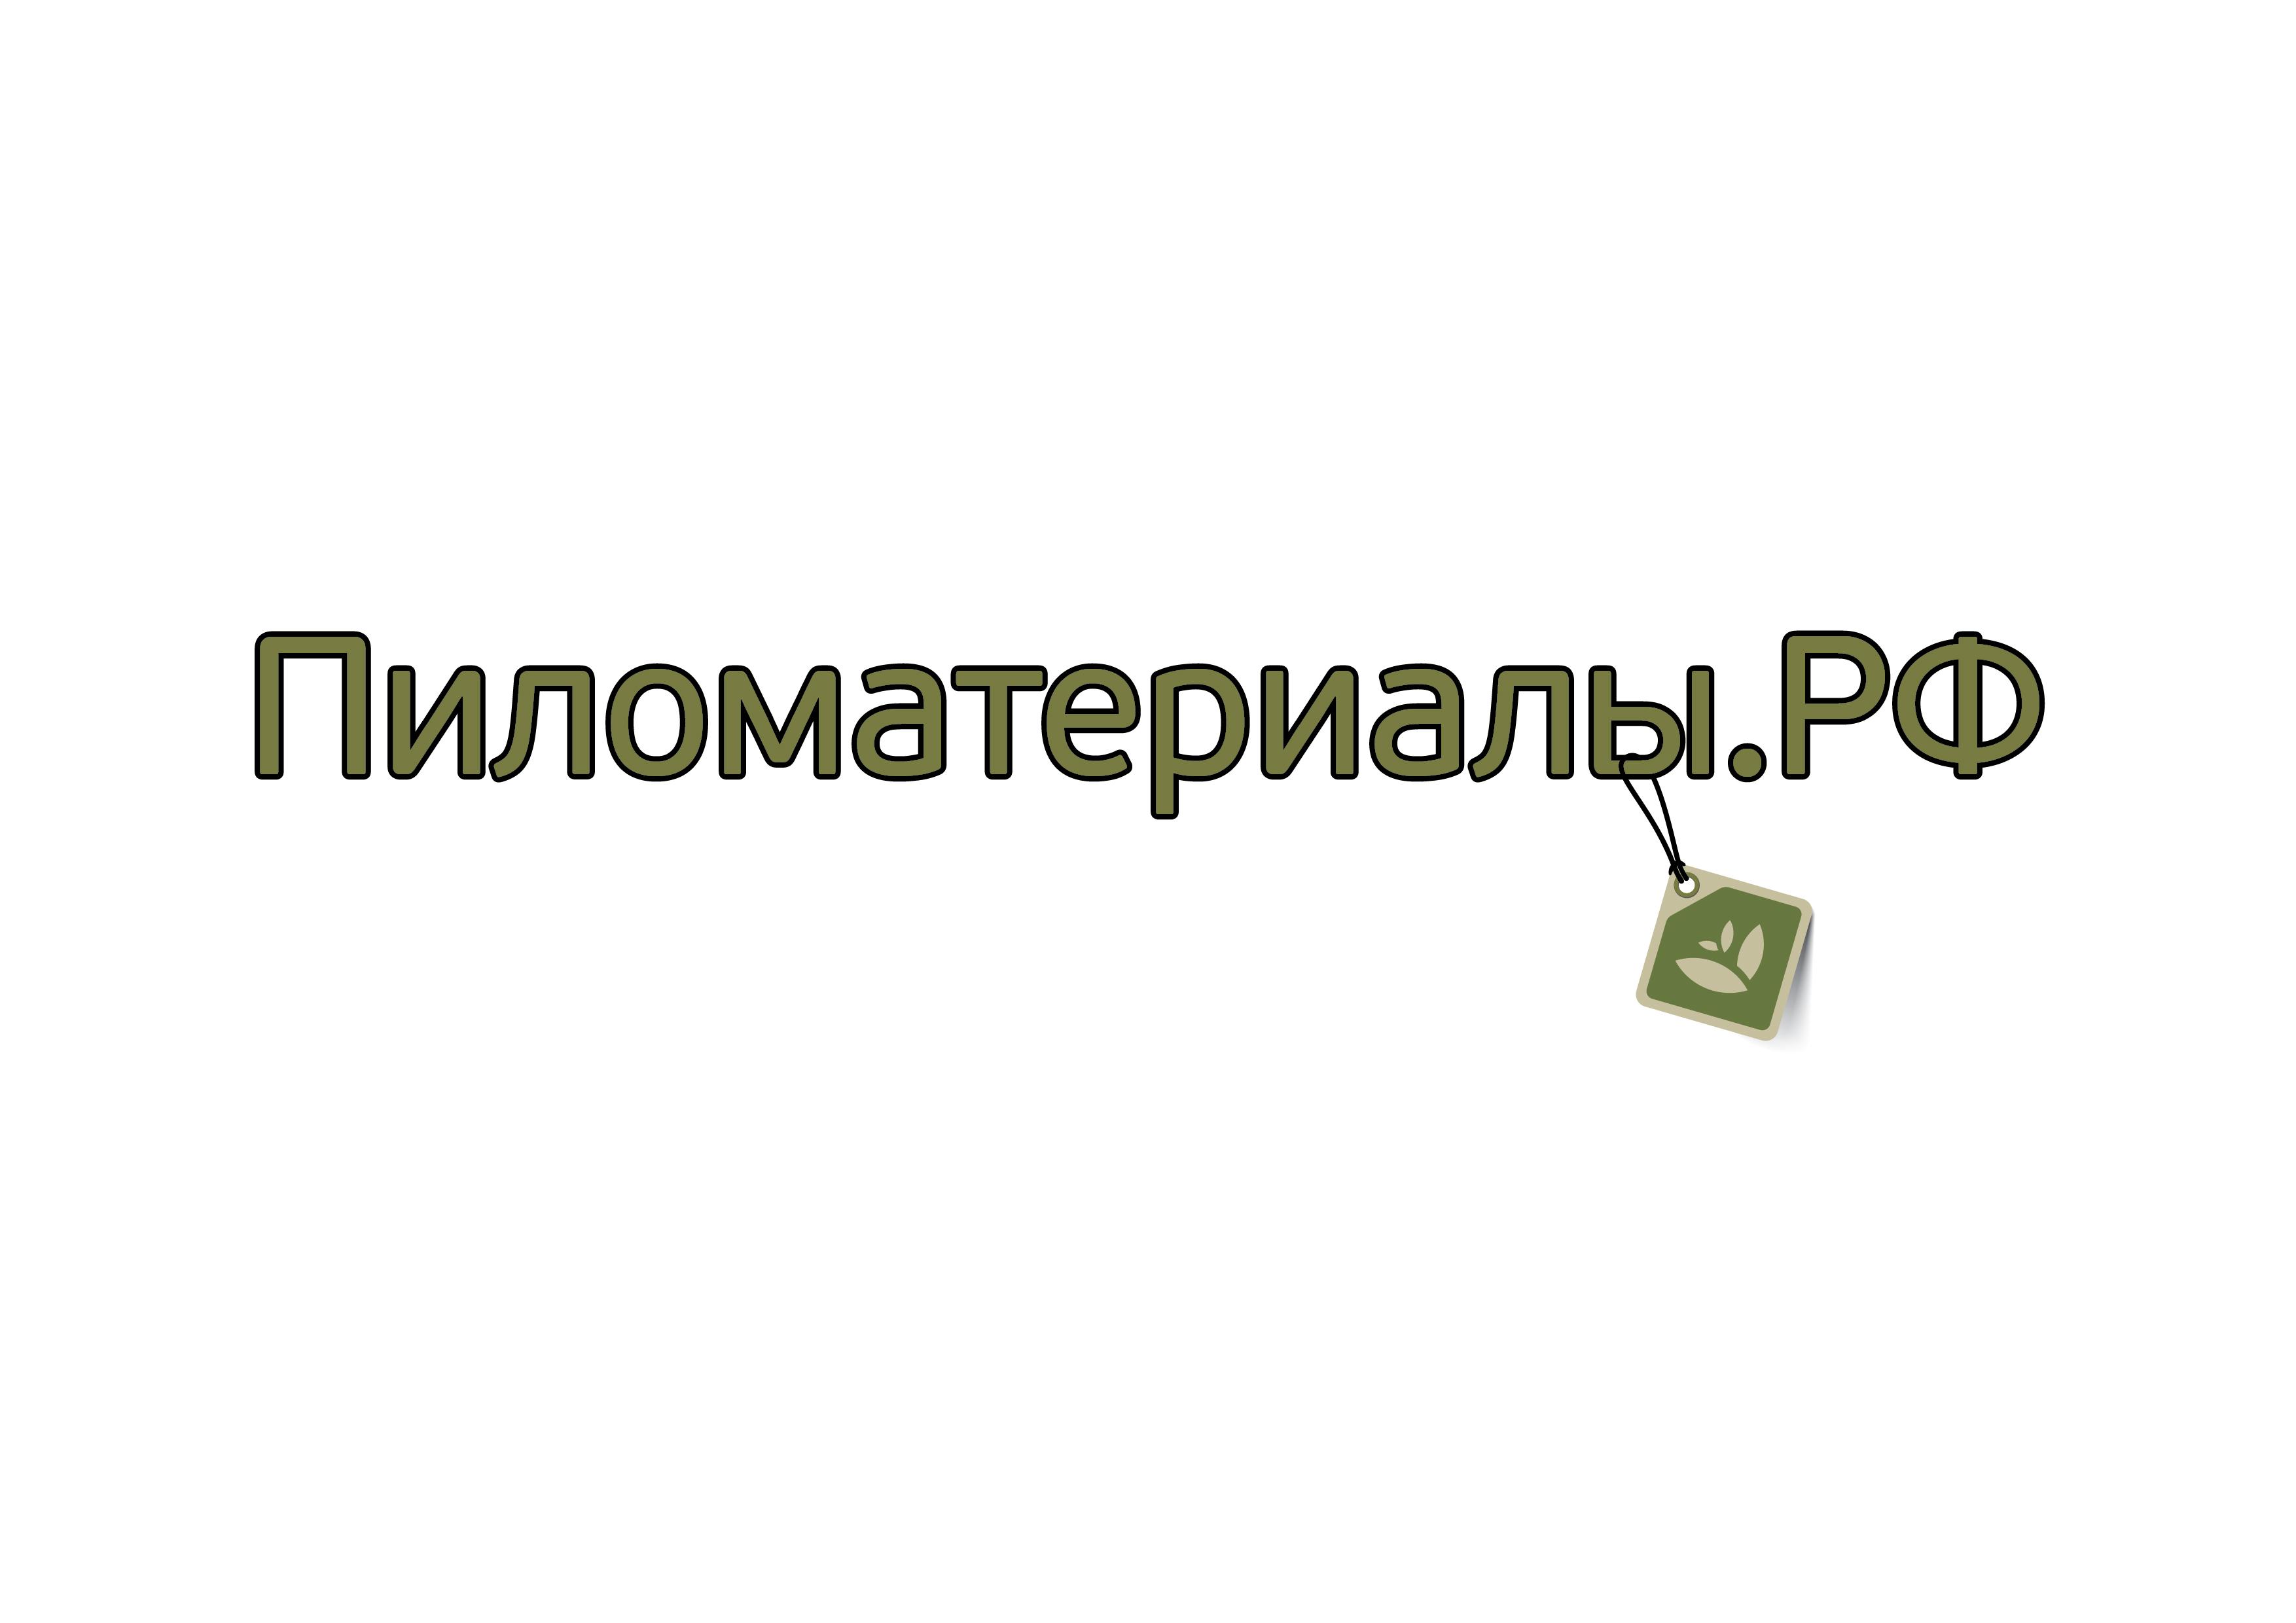 "Создание логотипа и фирменного стиля ""Пиломатериалы.РФ"" фото f_04652fa4596a793b.jpg"